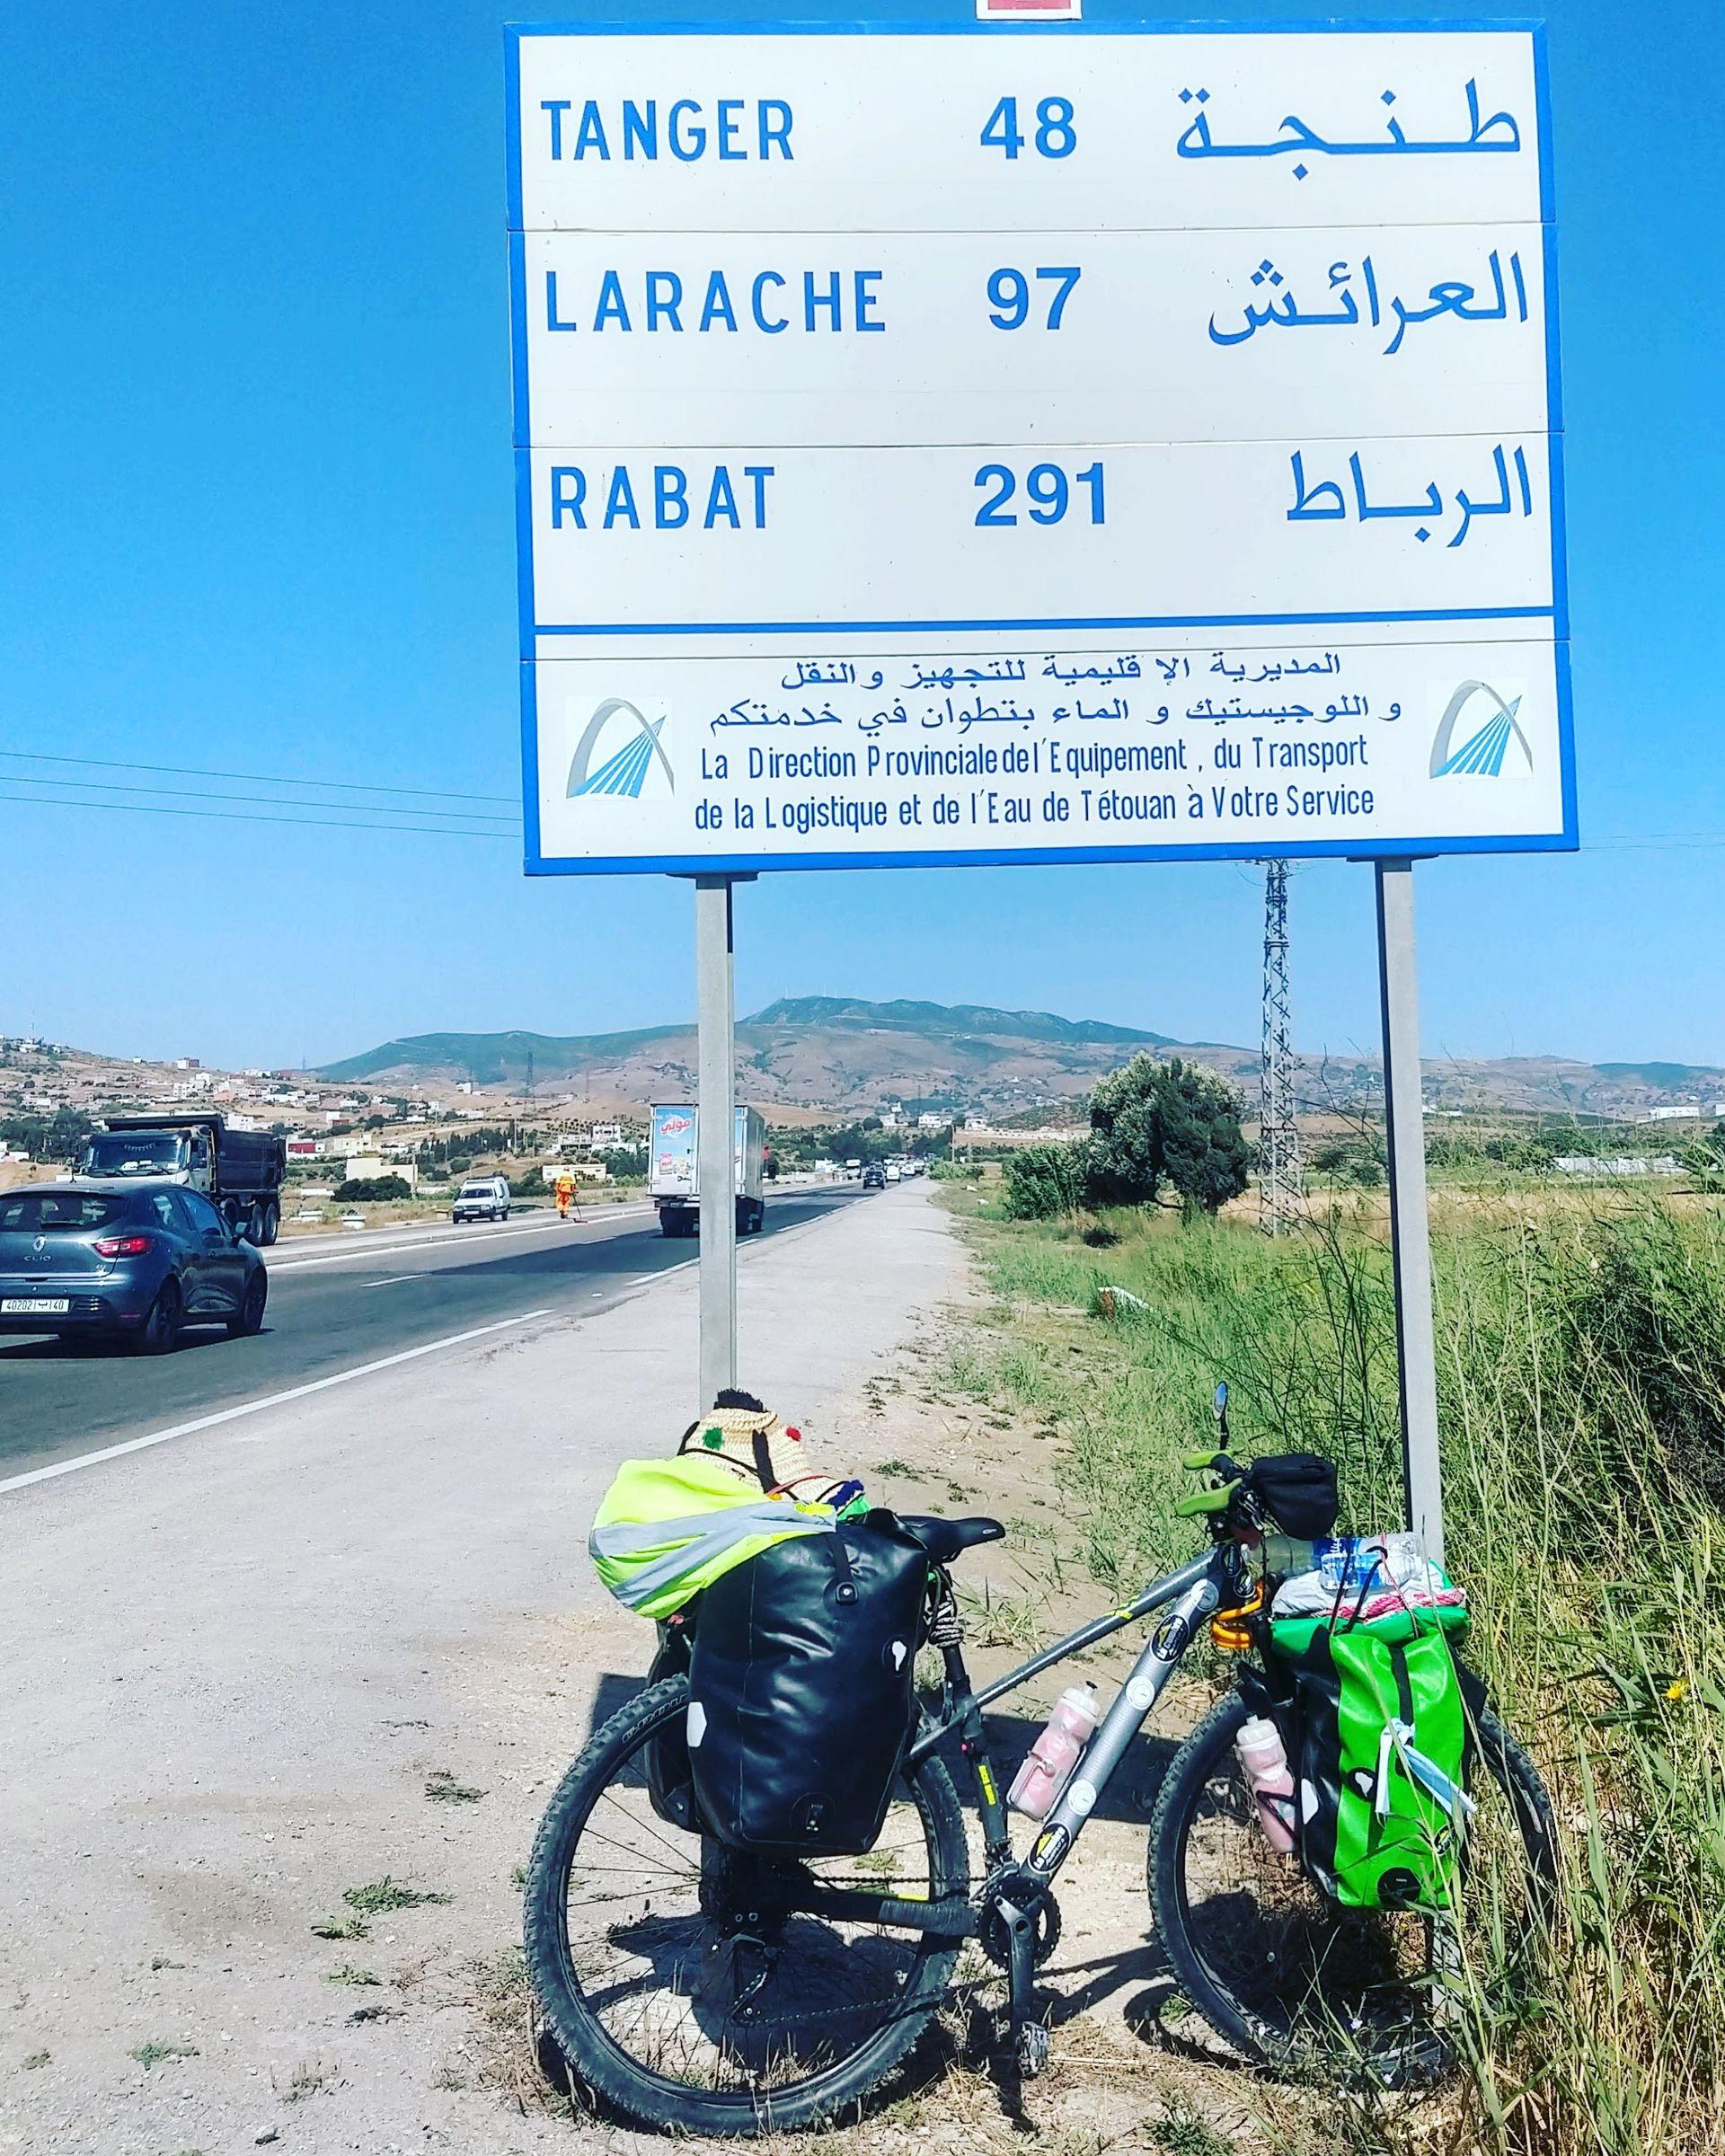 Fabiana recorrió por varias horas no tantos kilómetros en un calor abrasante.